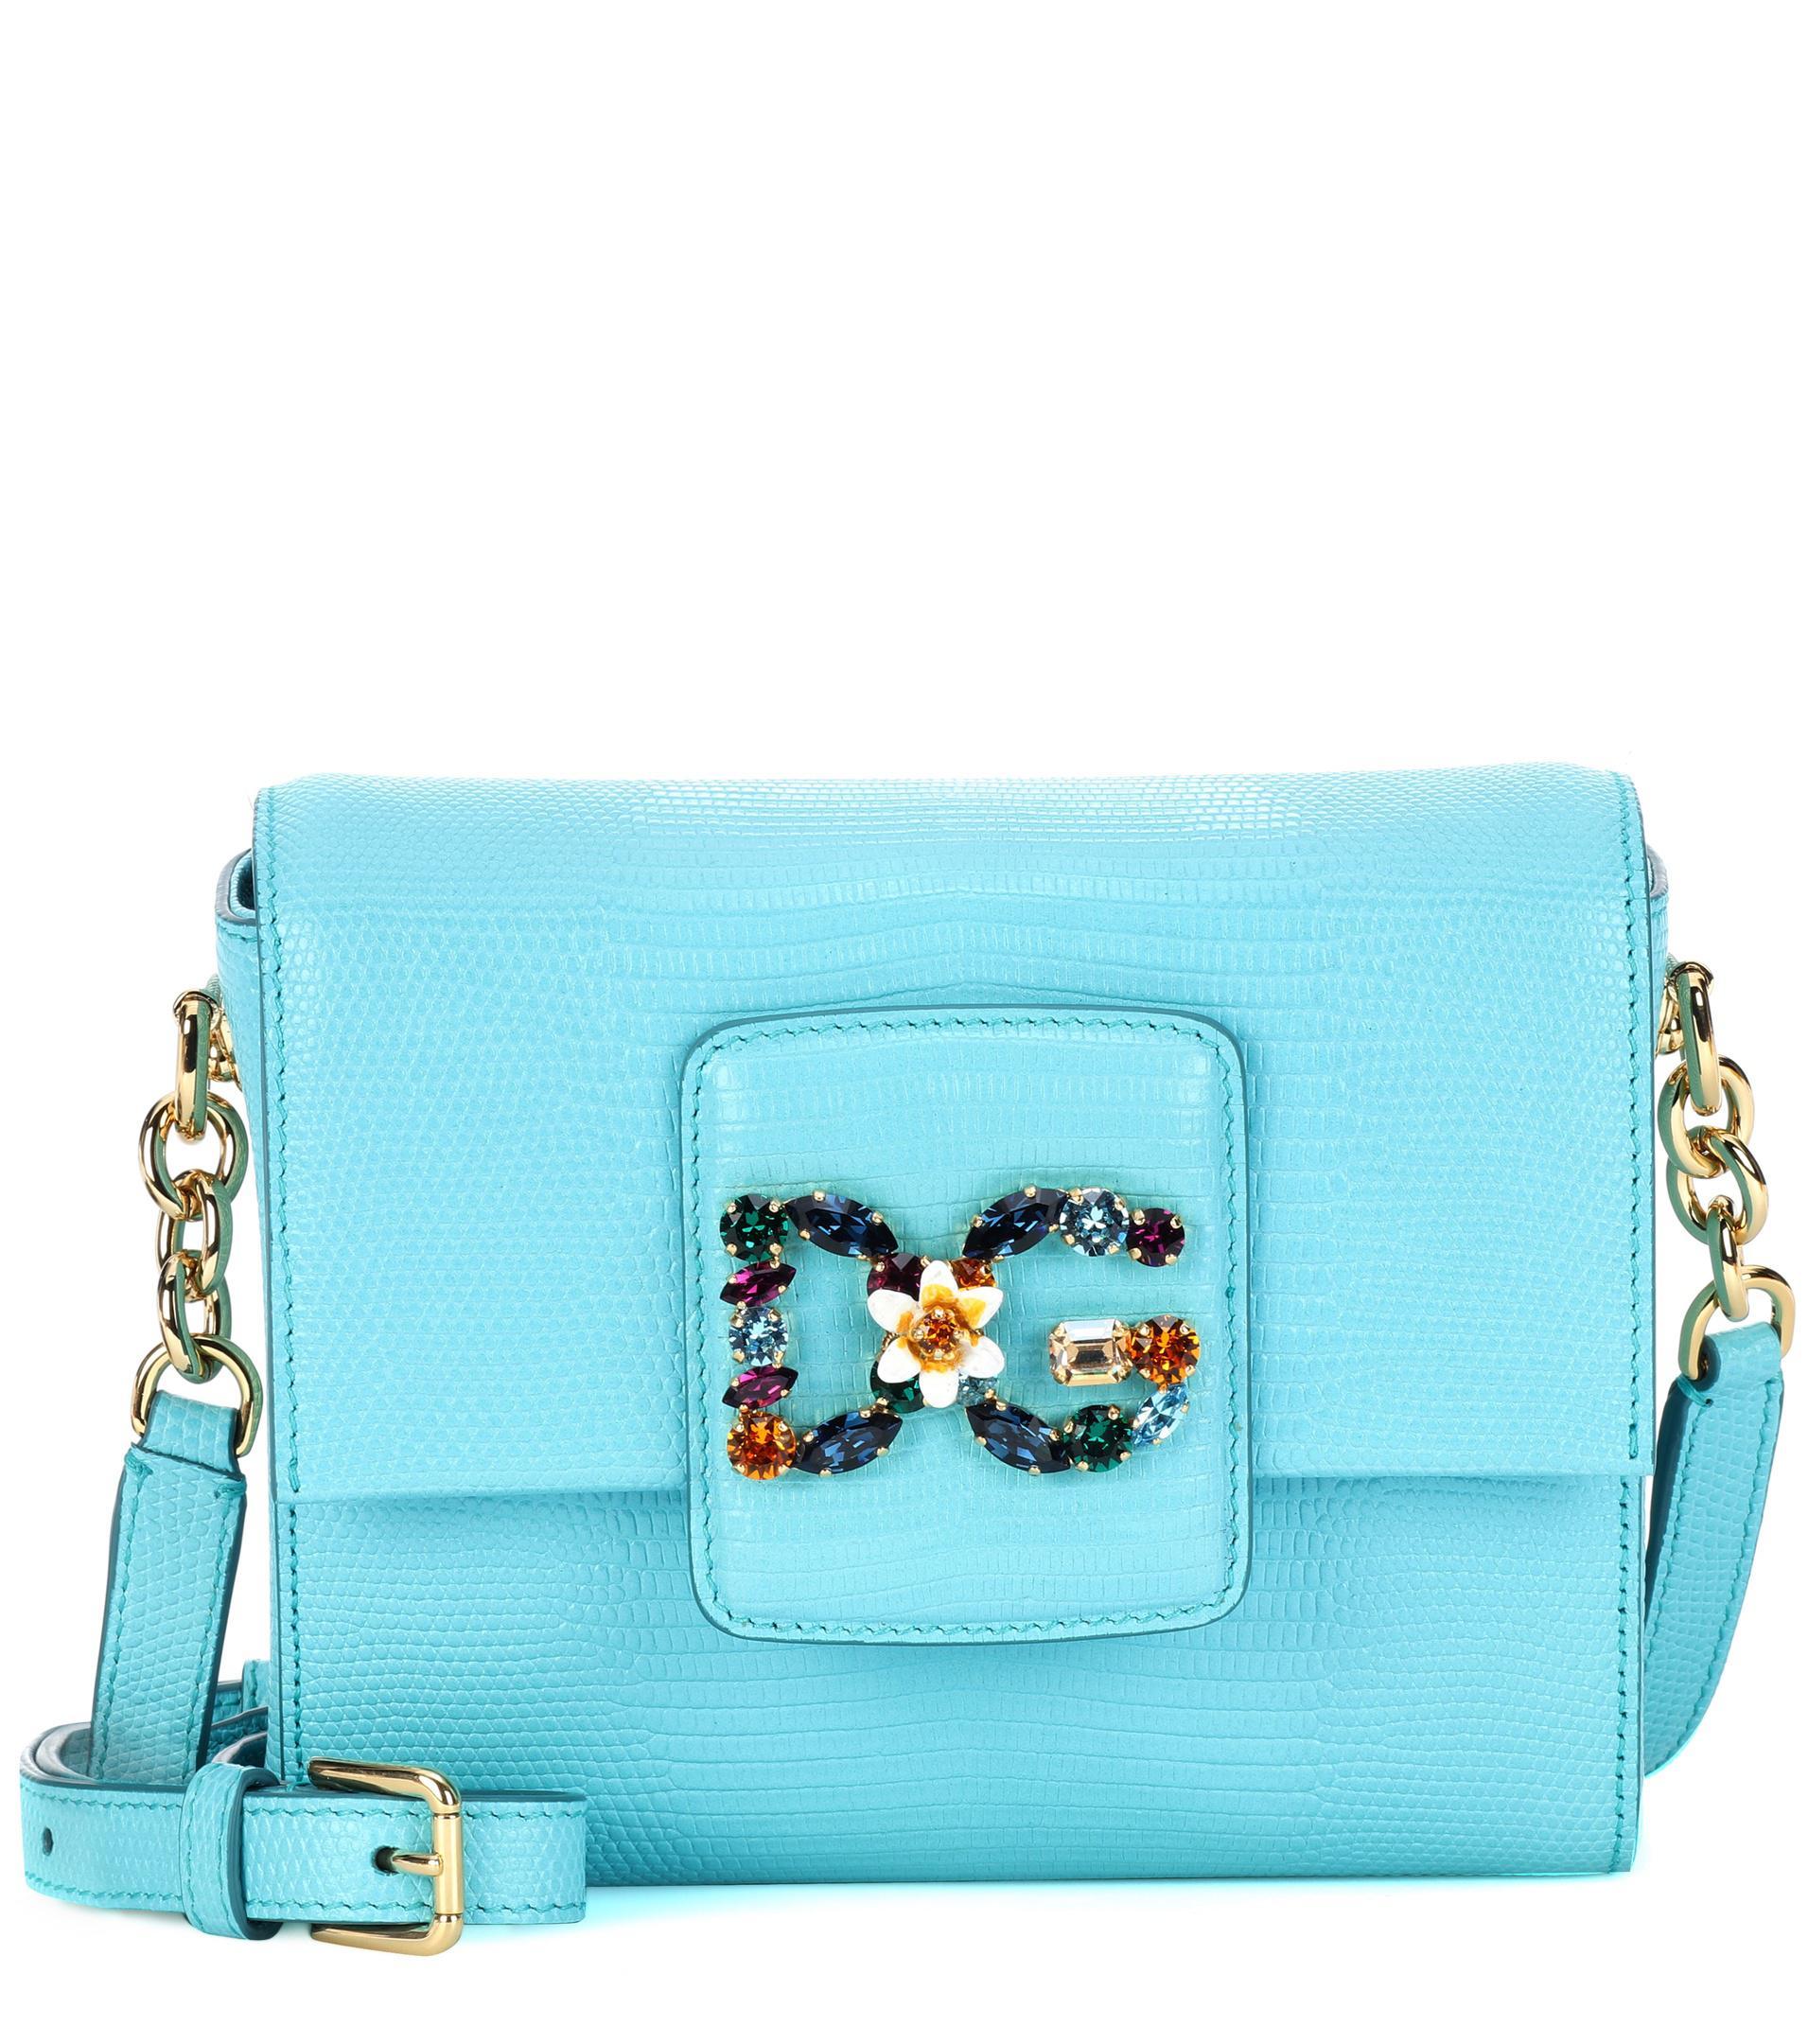 142ba7d21d70 Dolce   Gabbana Dg Millennials Mini Leather Shoulder Bag in Blue - Lyst